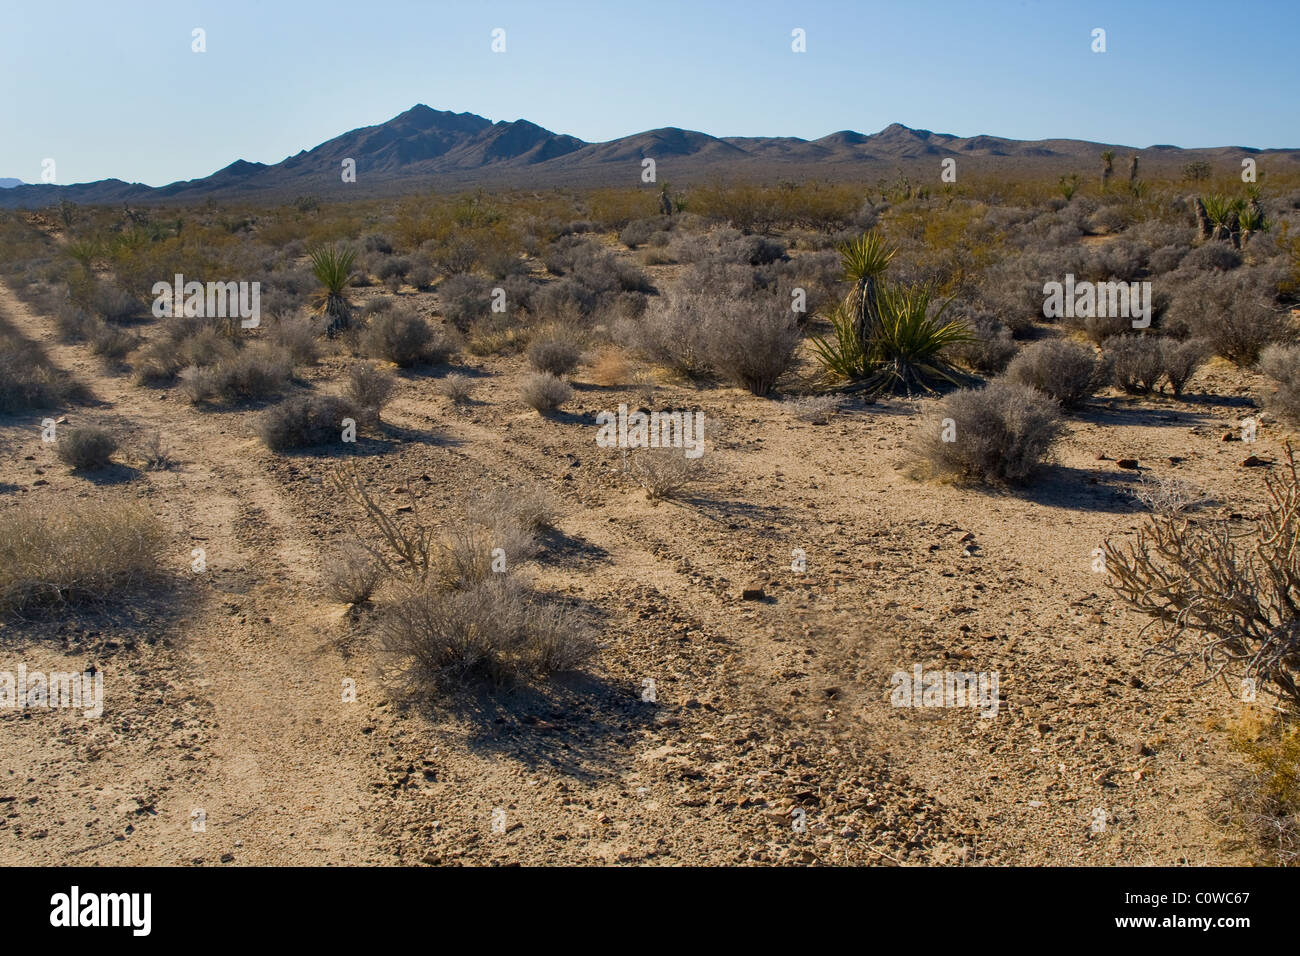 Tracks through the landscape of the Mojave Desert in California. - Stock Image